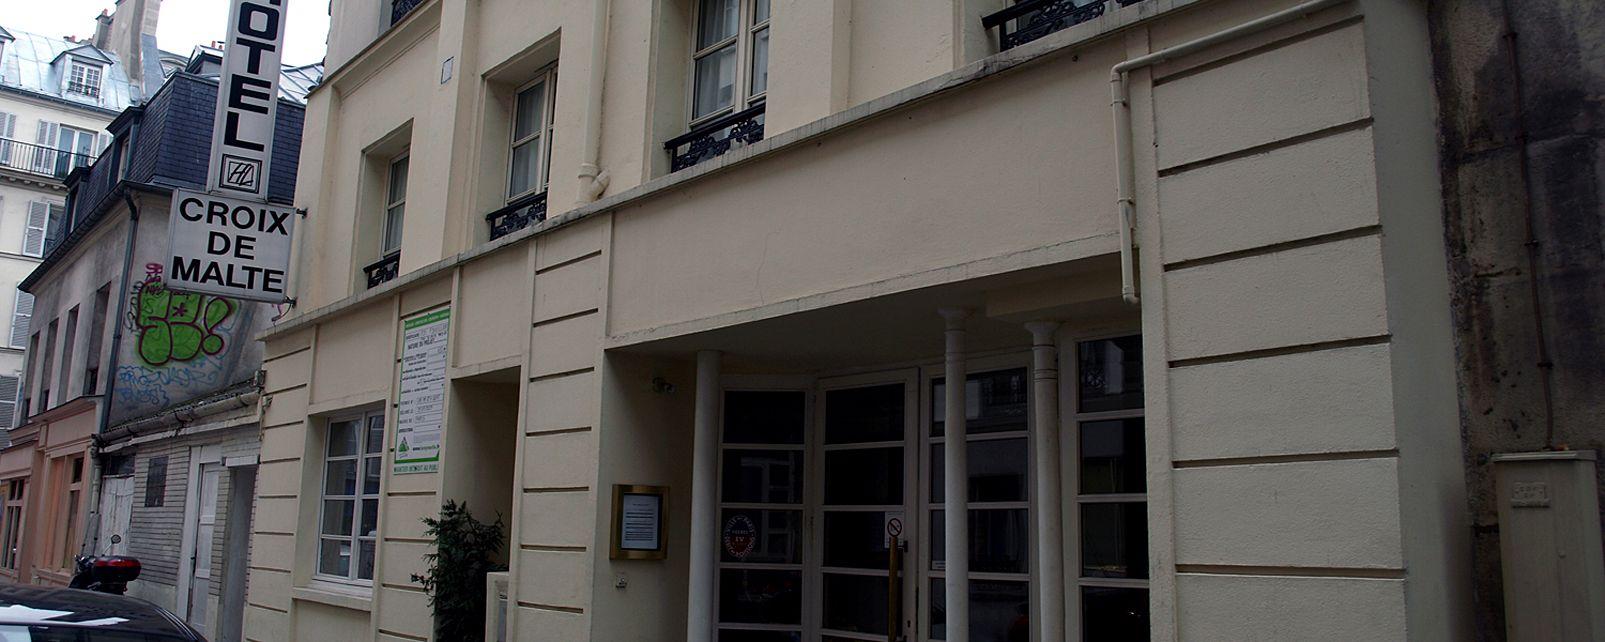 Hotel Croix de Malte